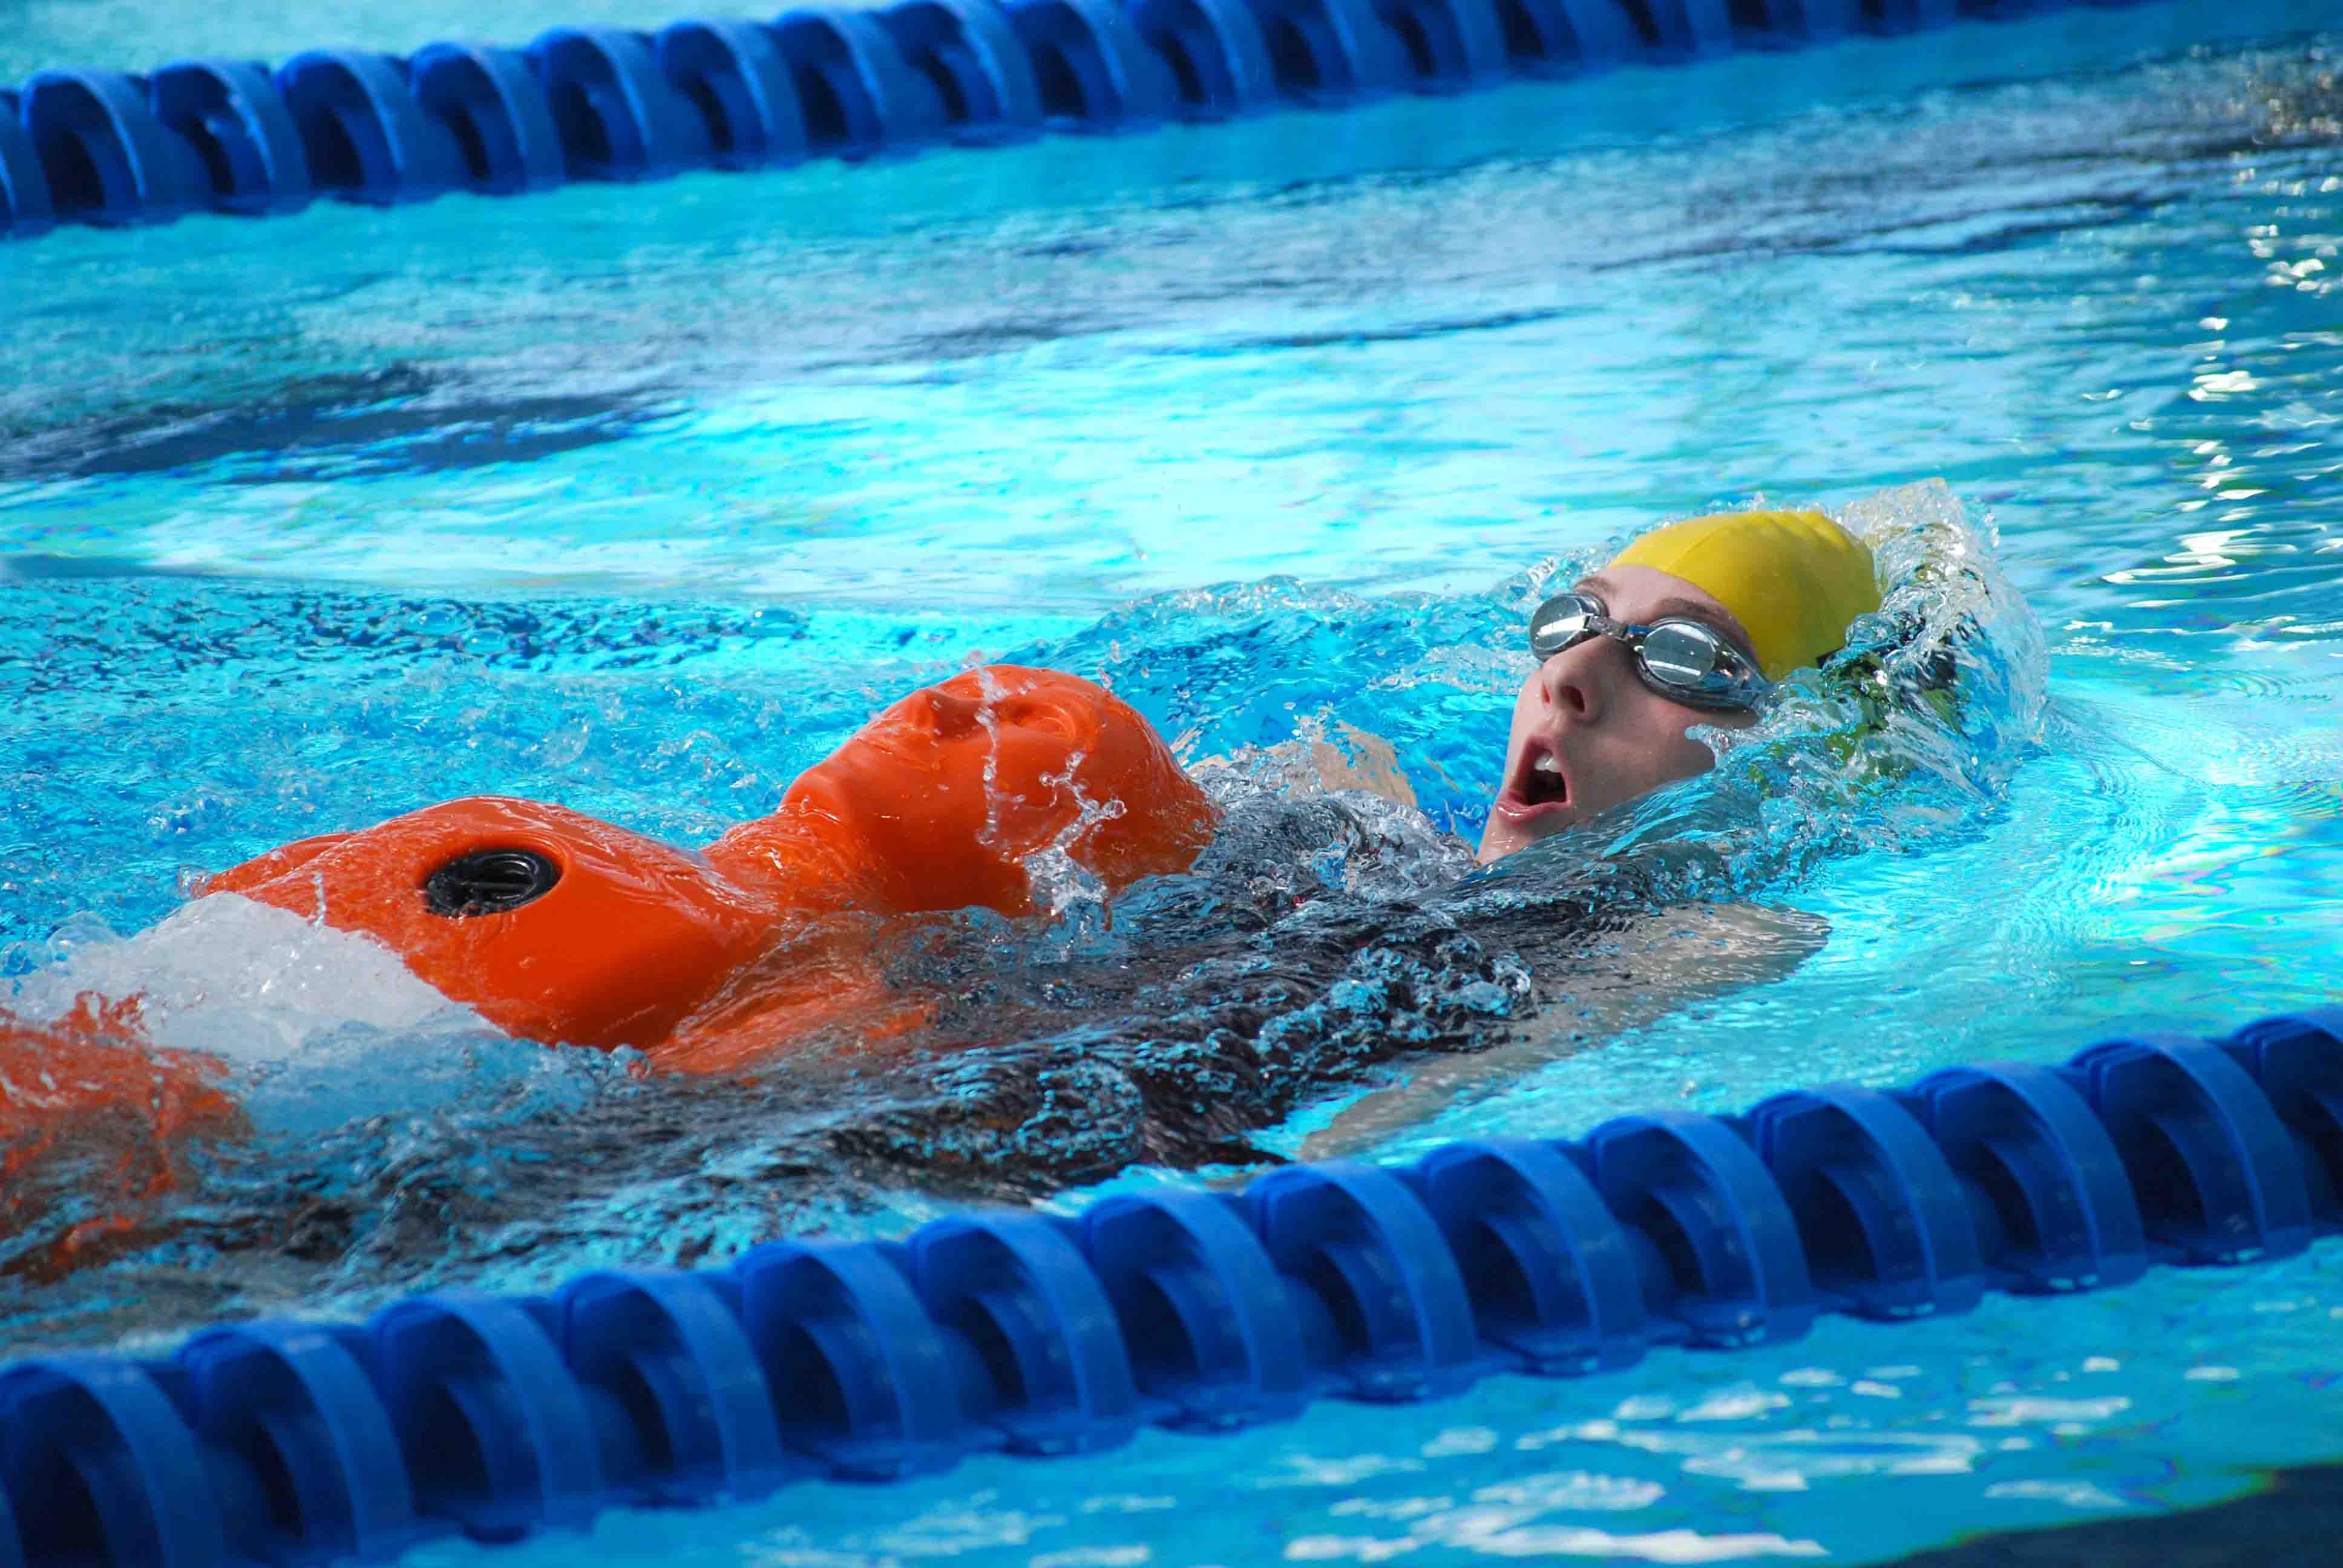 Ublsc - University of bristol swimming pool ...